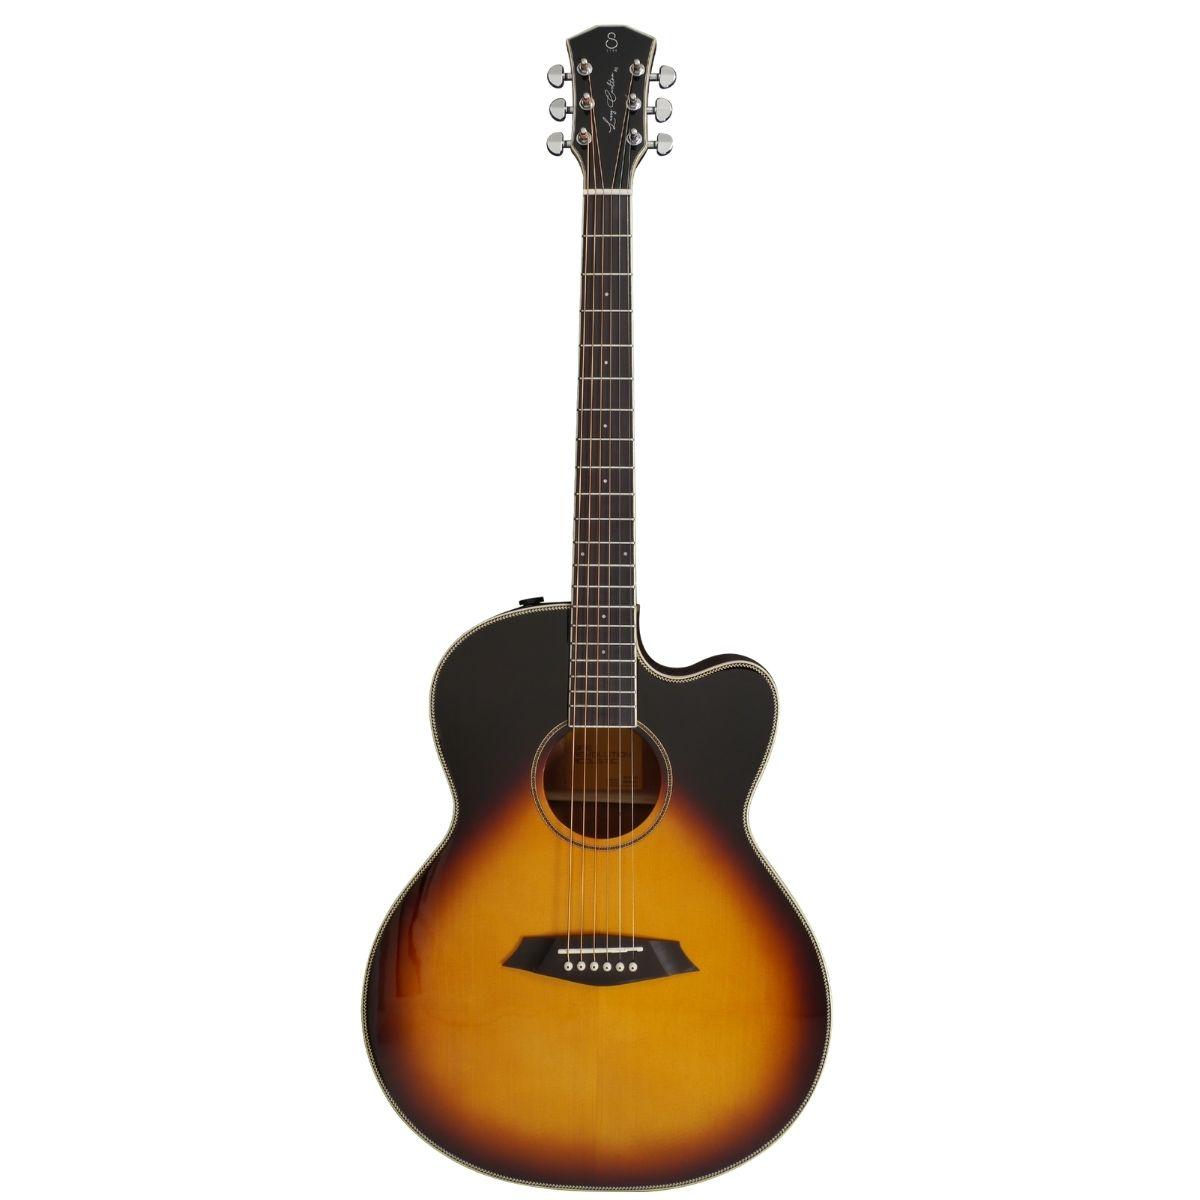 Sire Larry Carlton A3-G VS western-guitar vintage sunburst